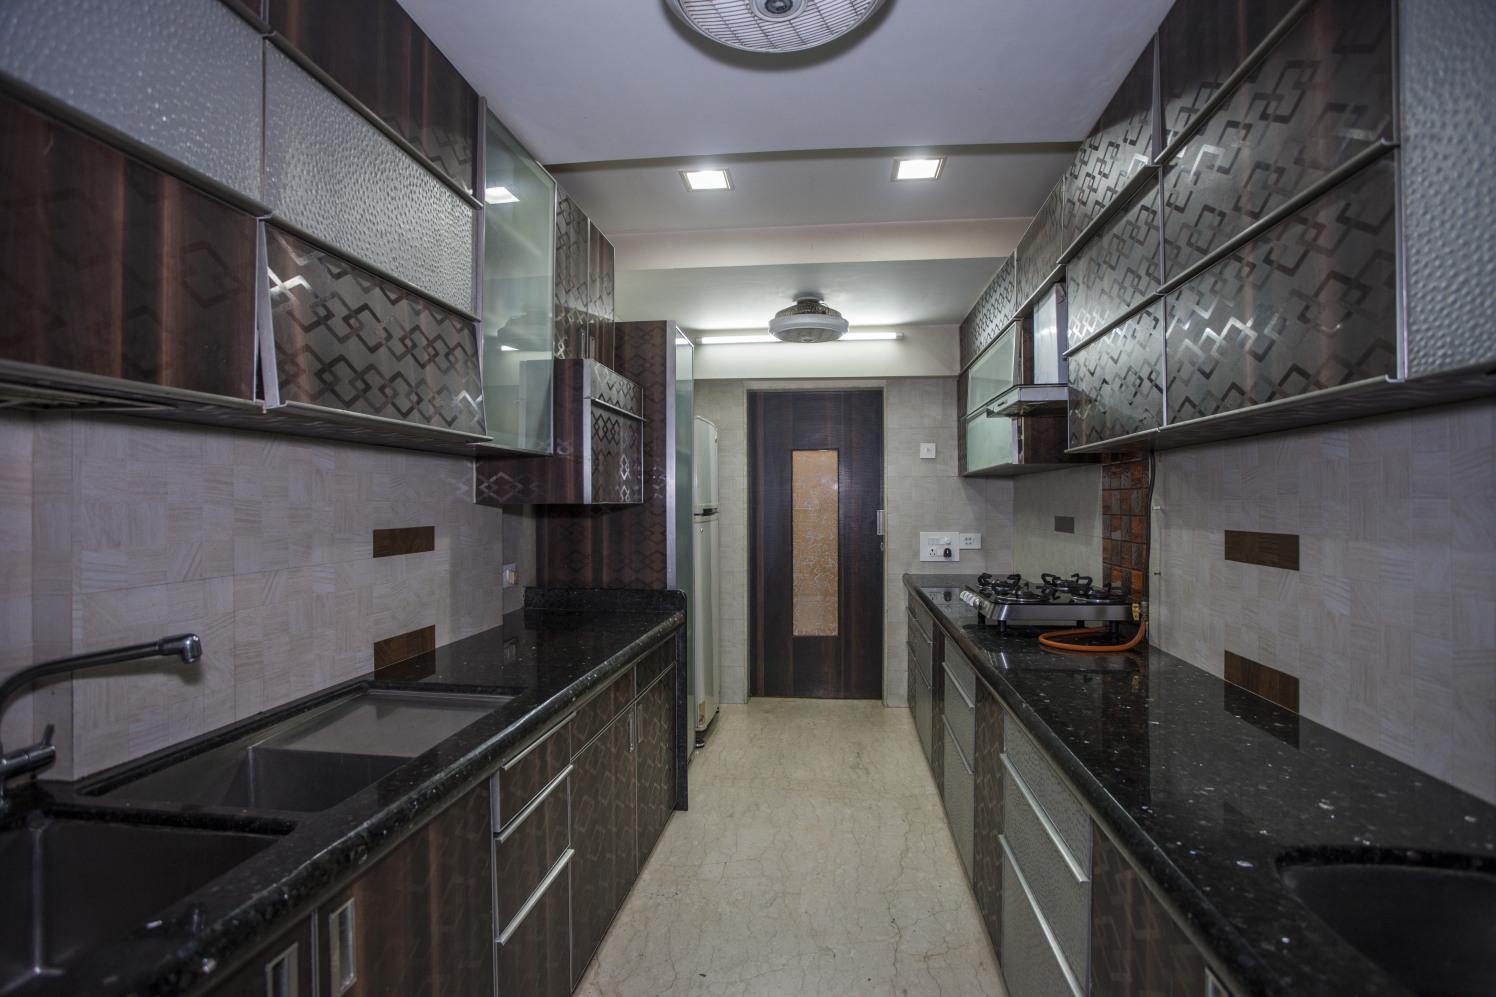 Modern Modular Kitchen by Plus One Interiors Modular-kitchen Modern | Interior Design Photos & Ideas